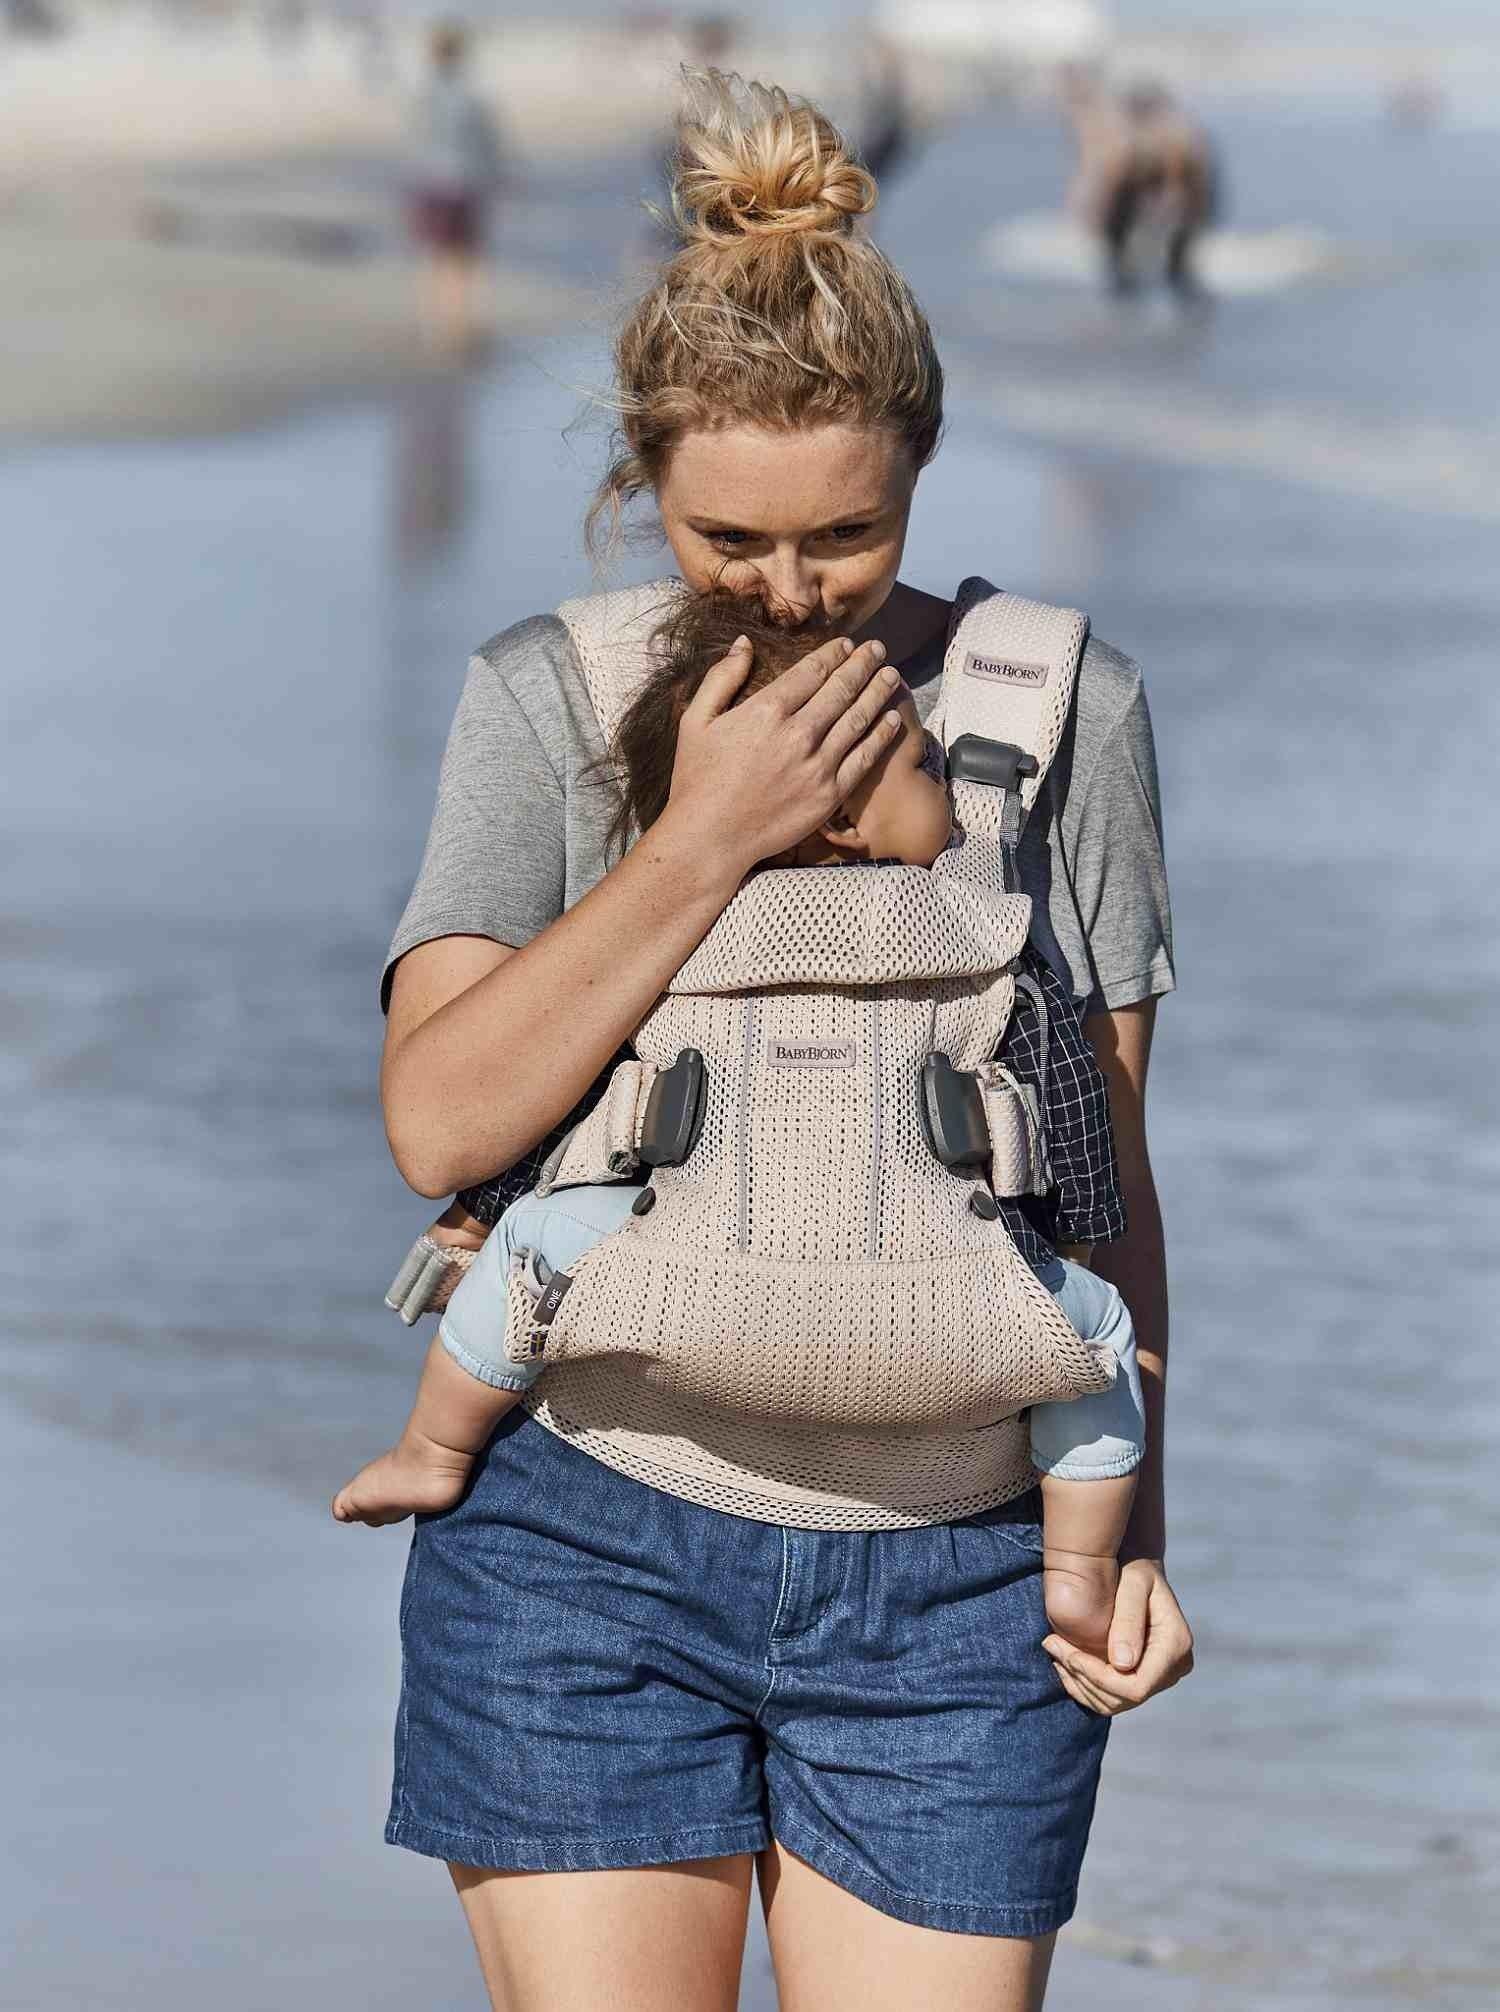 BABYBJORN ONE AIR 3D  - nosidełko, Perłowy Różowy